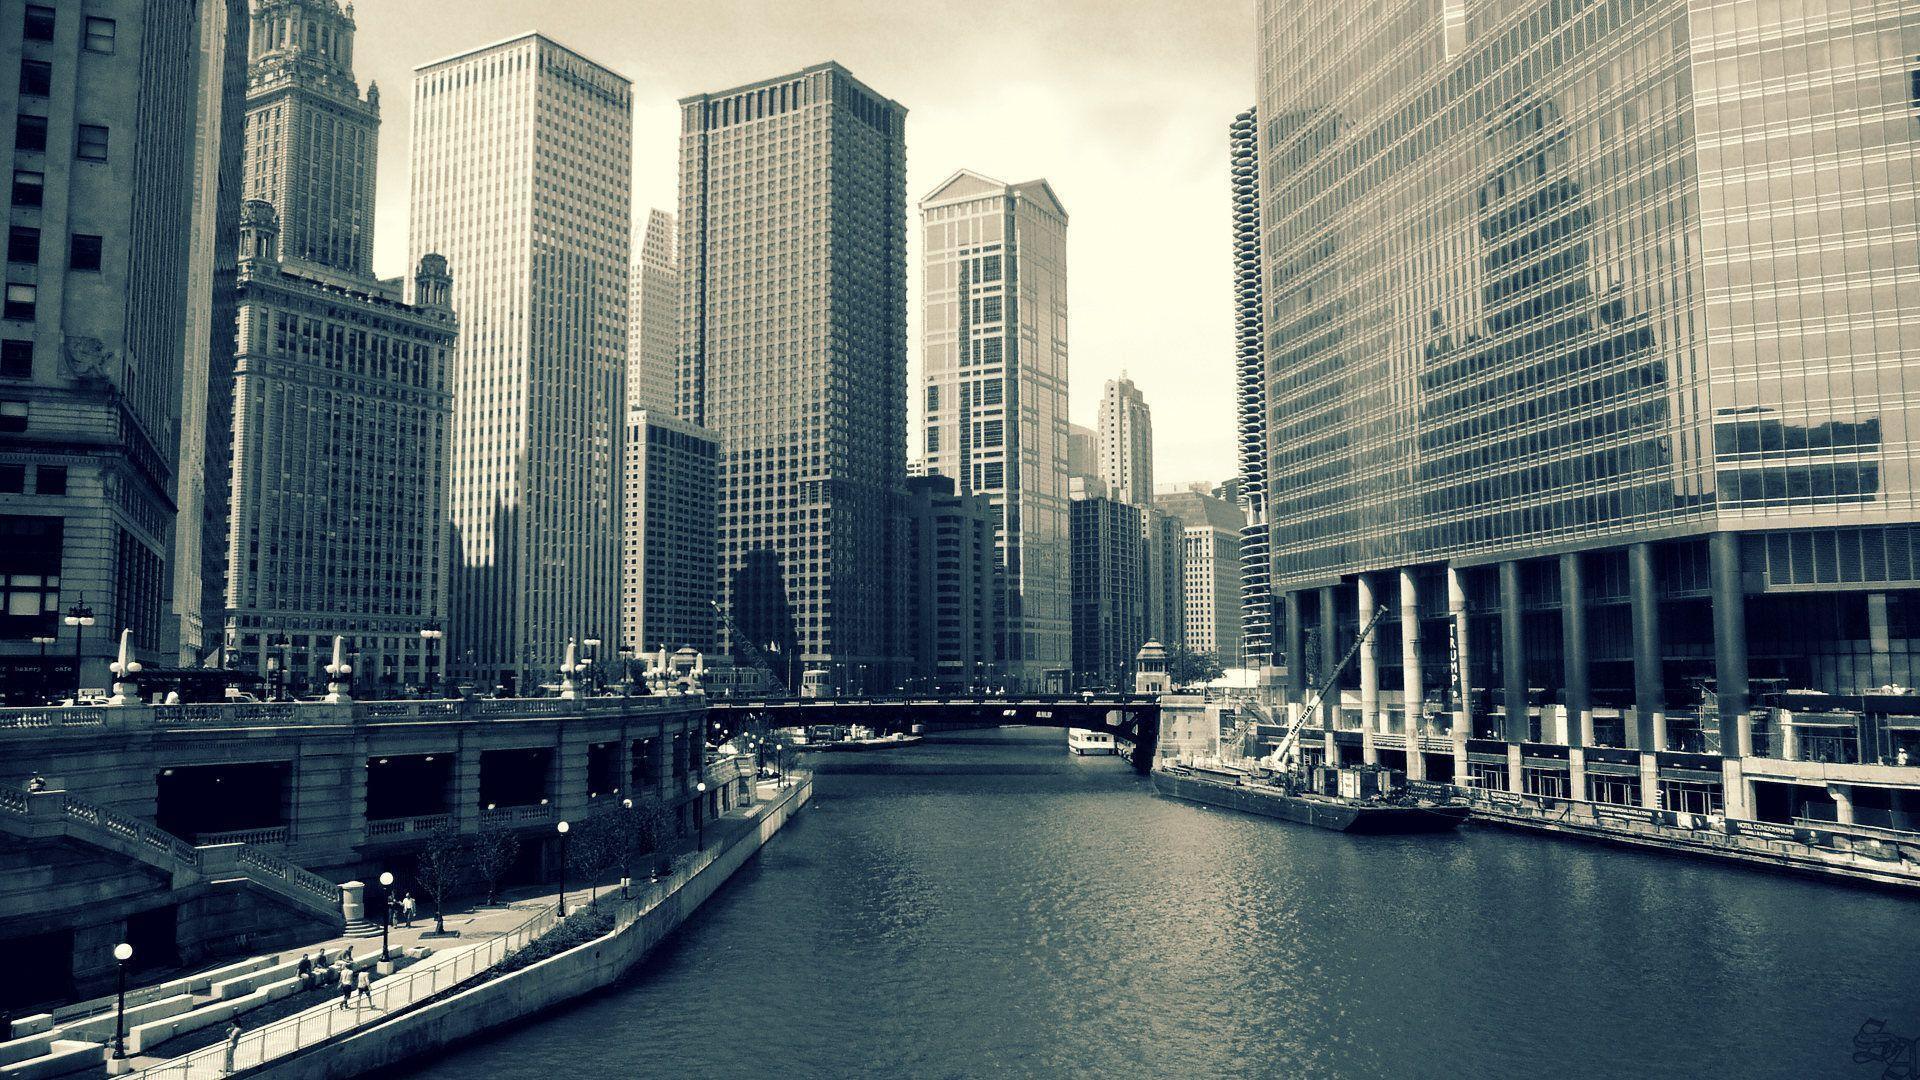 Chicago at Night Wallpaper | Theme Bin - Customization, HD ...